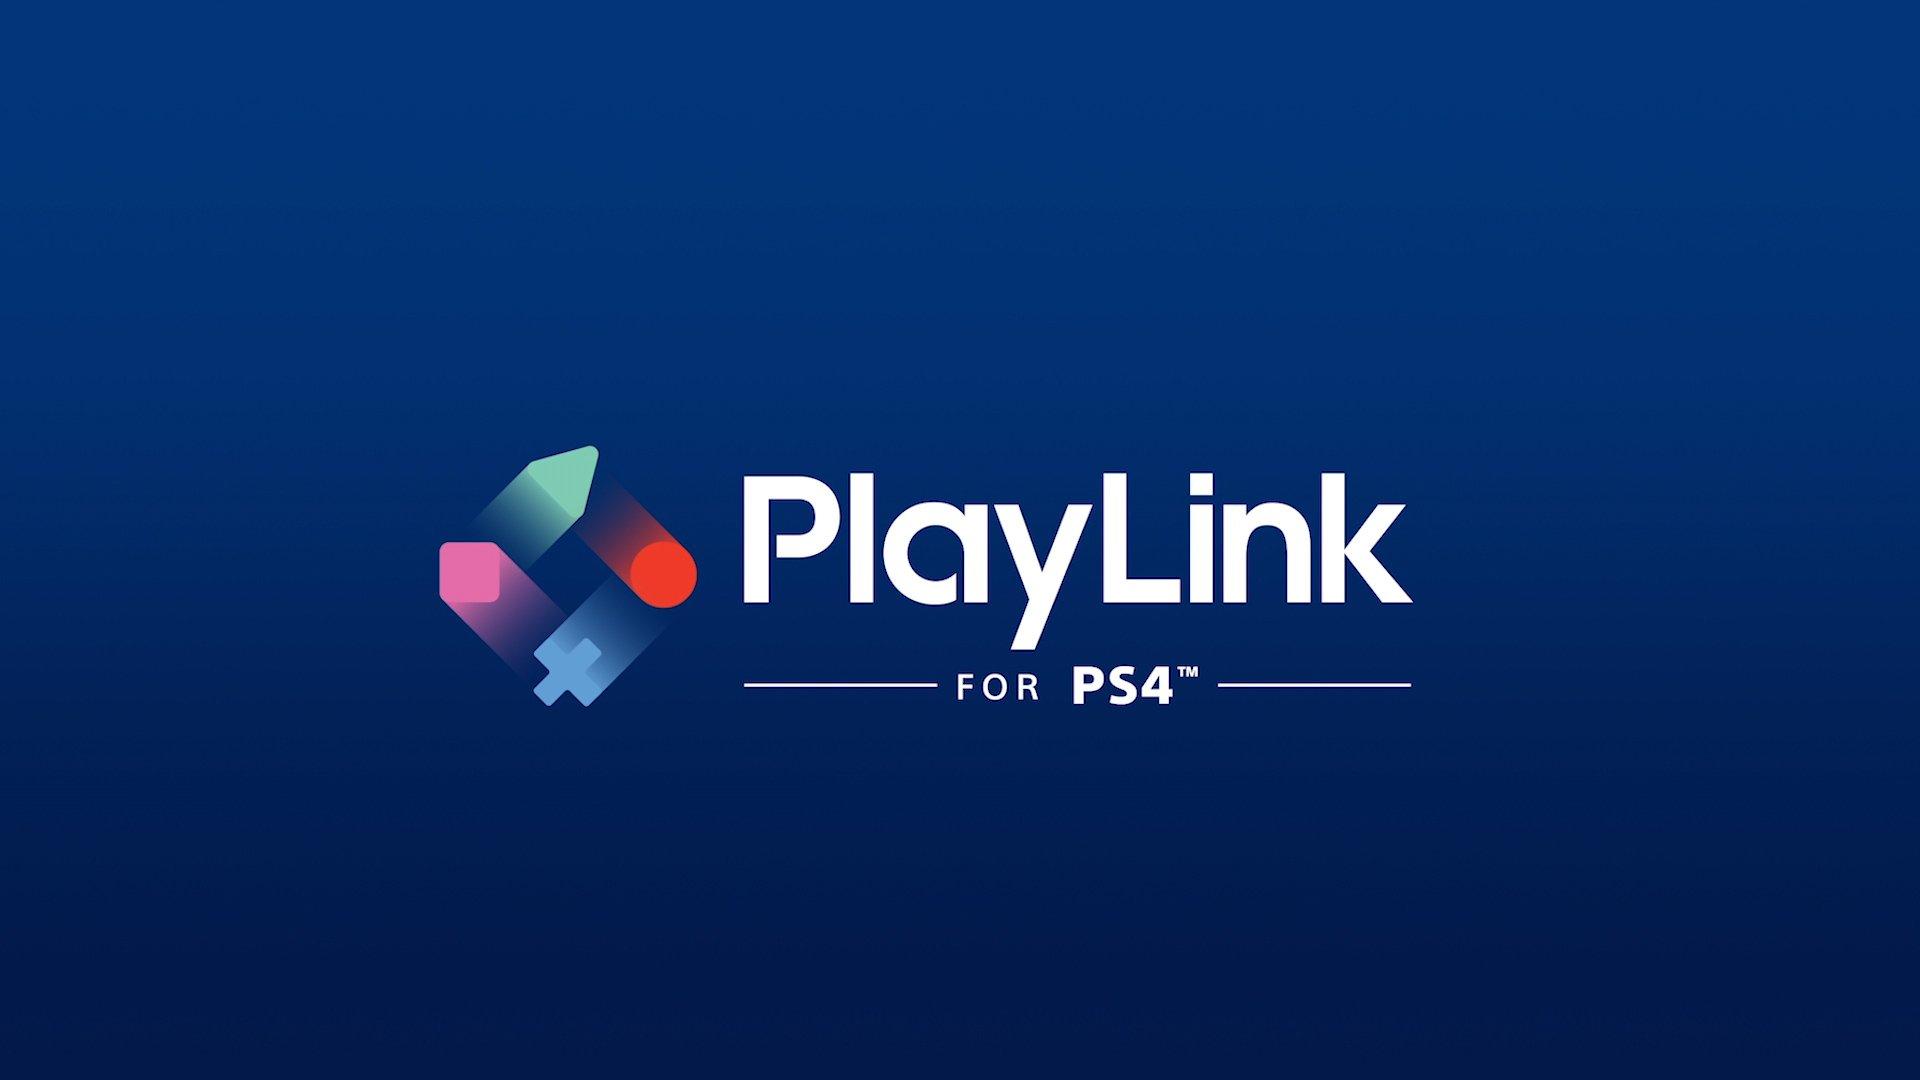 Sony hat 60 Millionen PS4-Konsolen verkauft